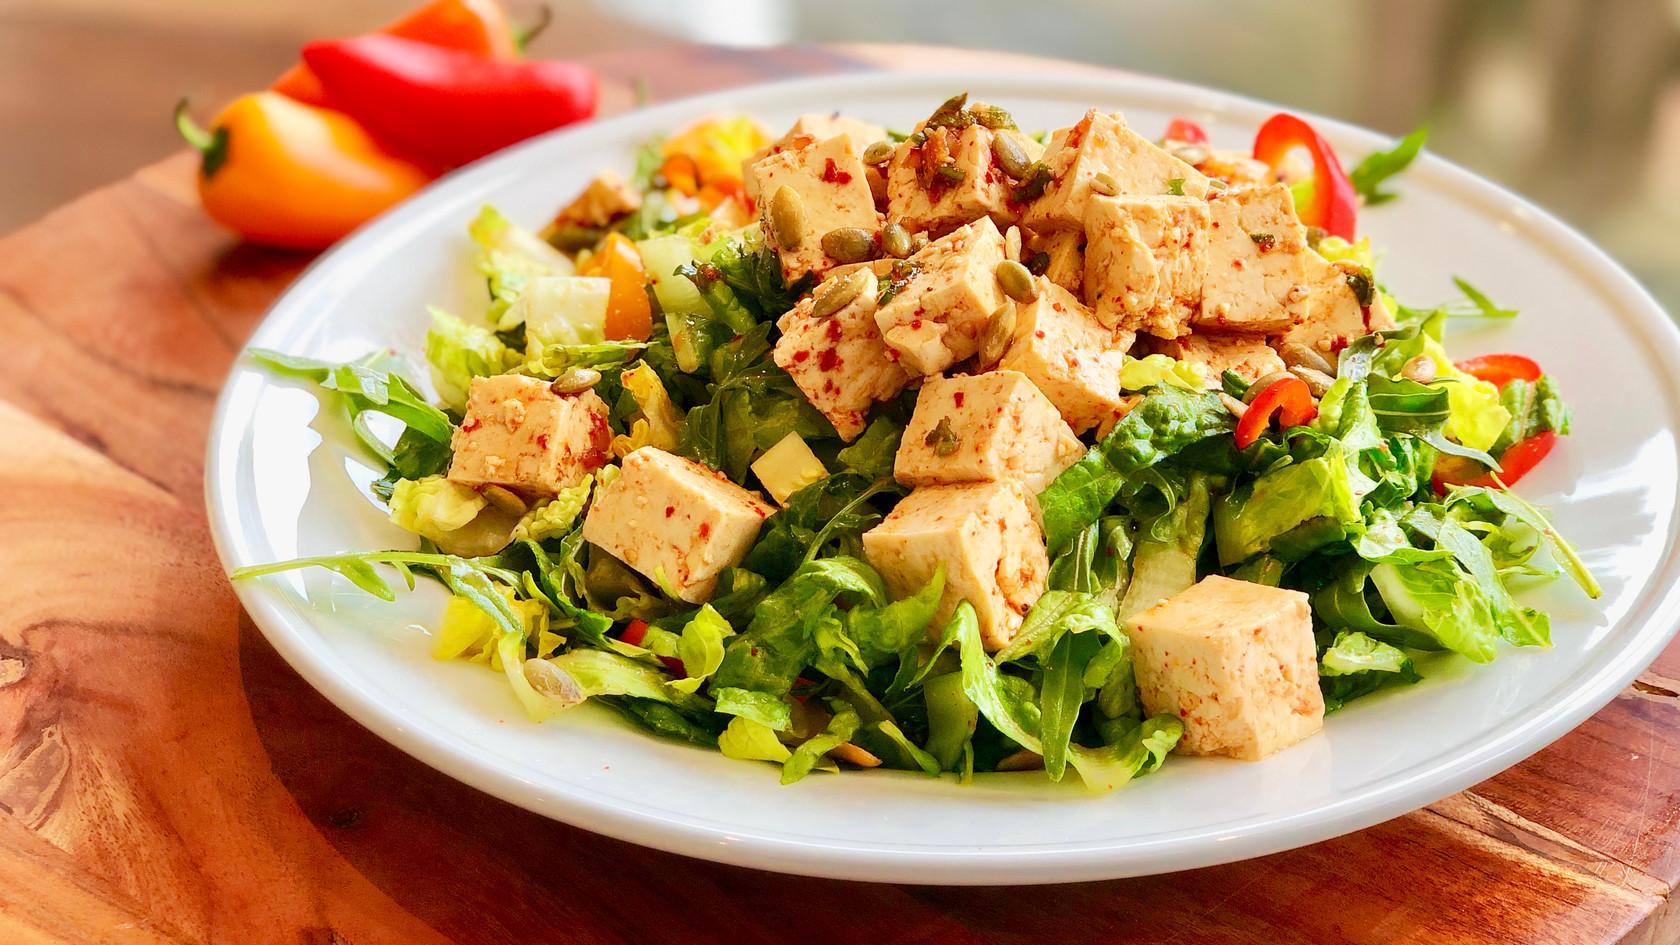 Tofu Salad With Soy Sauce Vinaigrette Dressing (두부 샐러드)